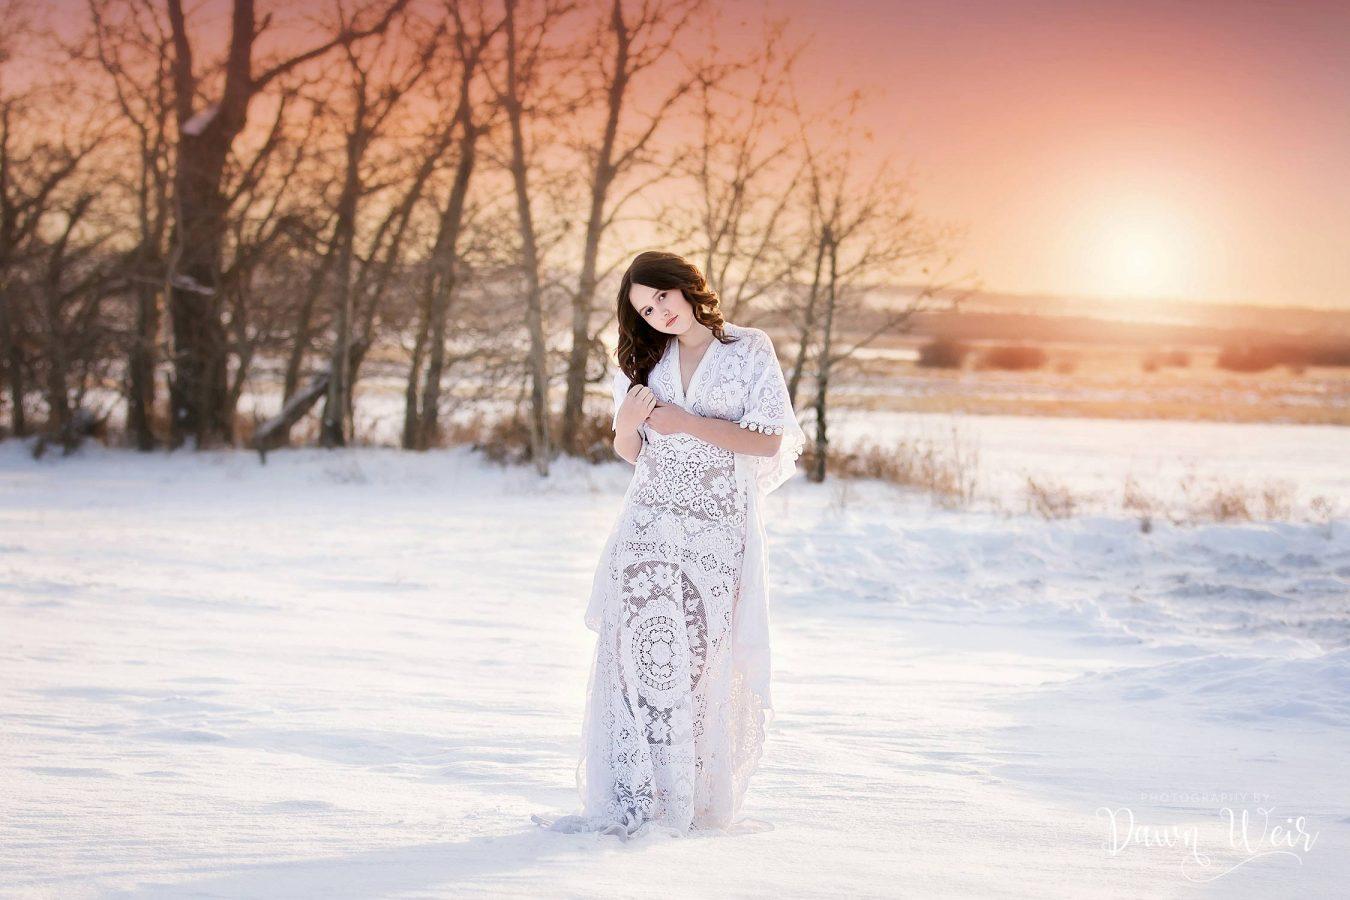 photo-by-edmonton-model-photographer-dawn-weir-reclamation-dress-winter-sunset